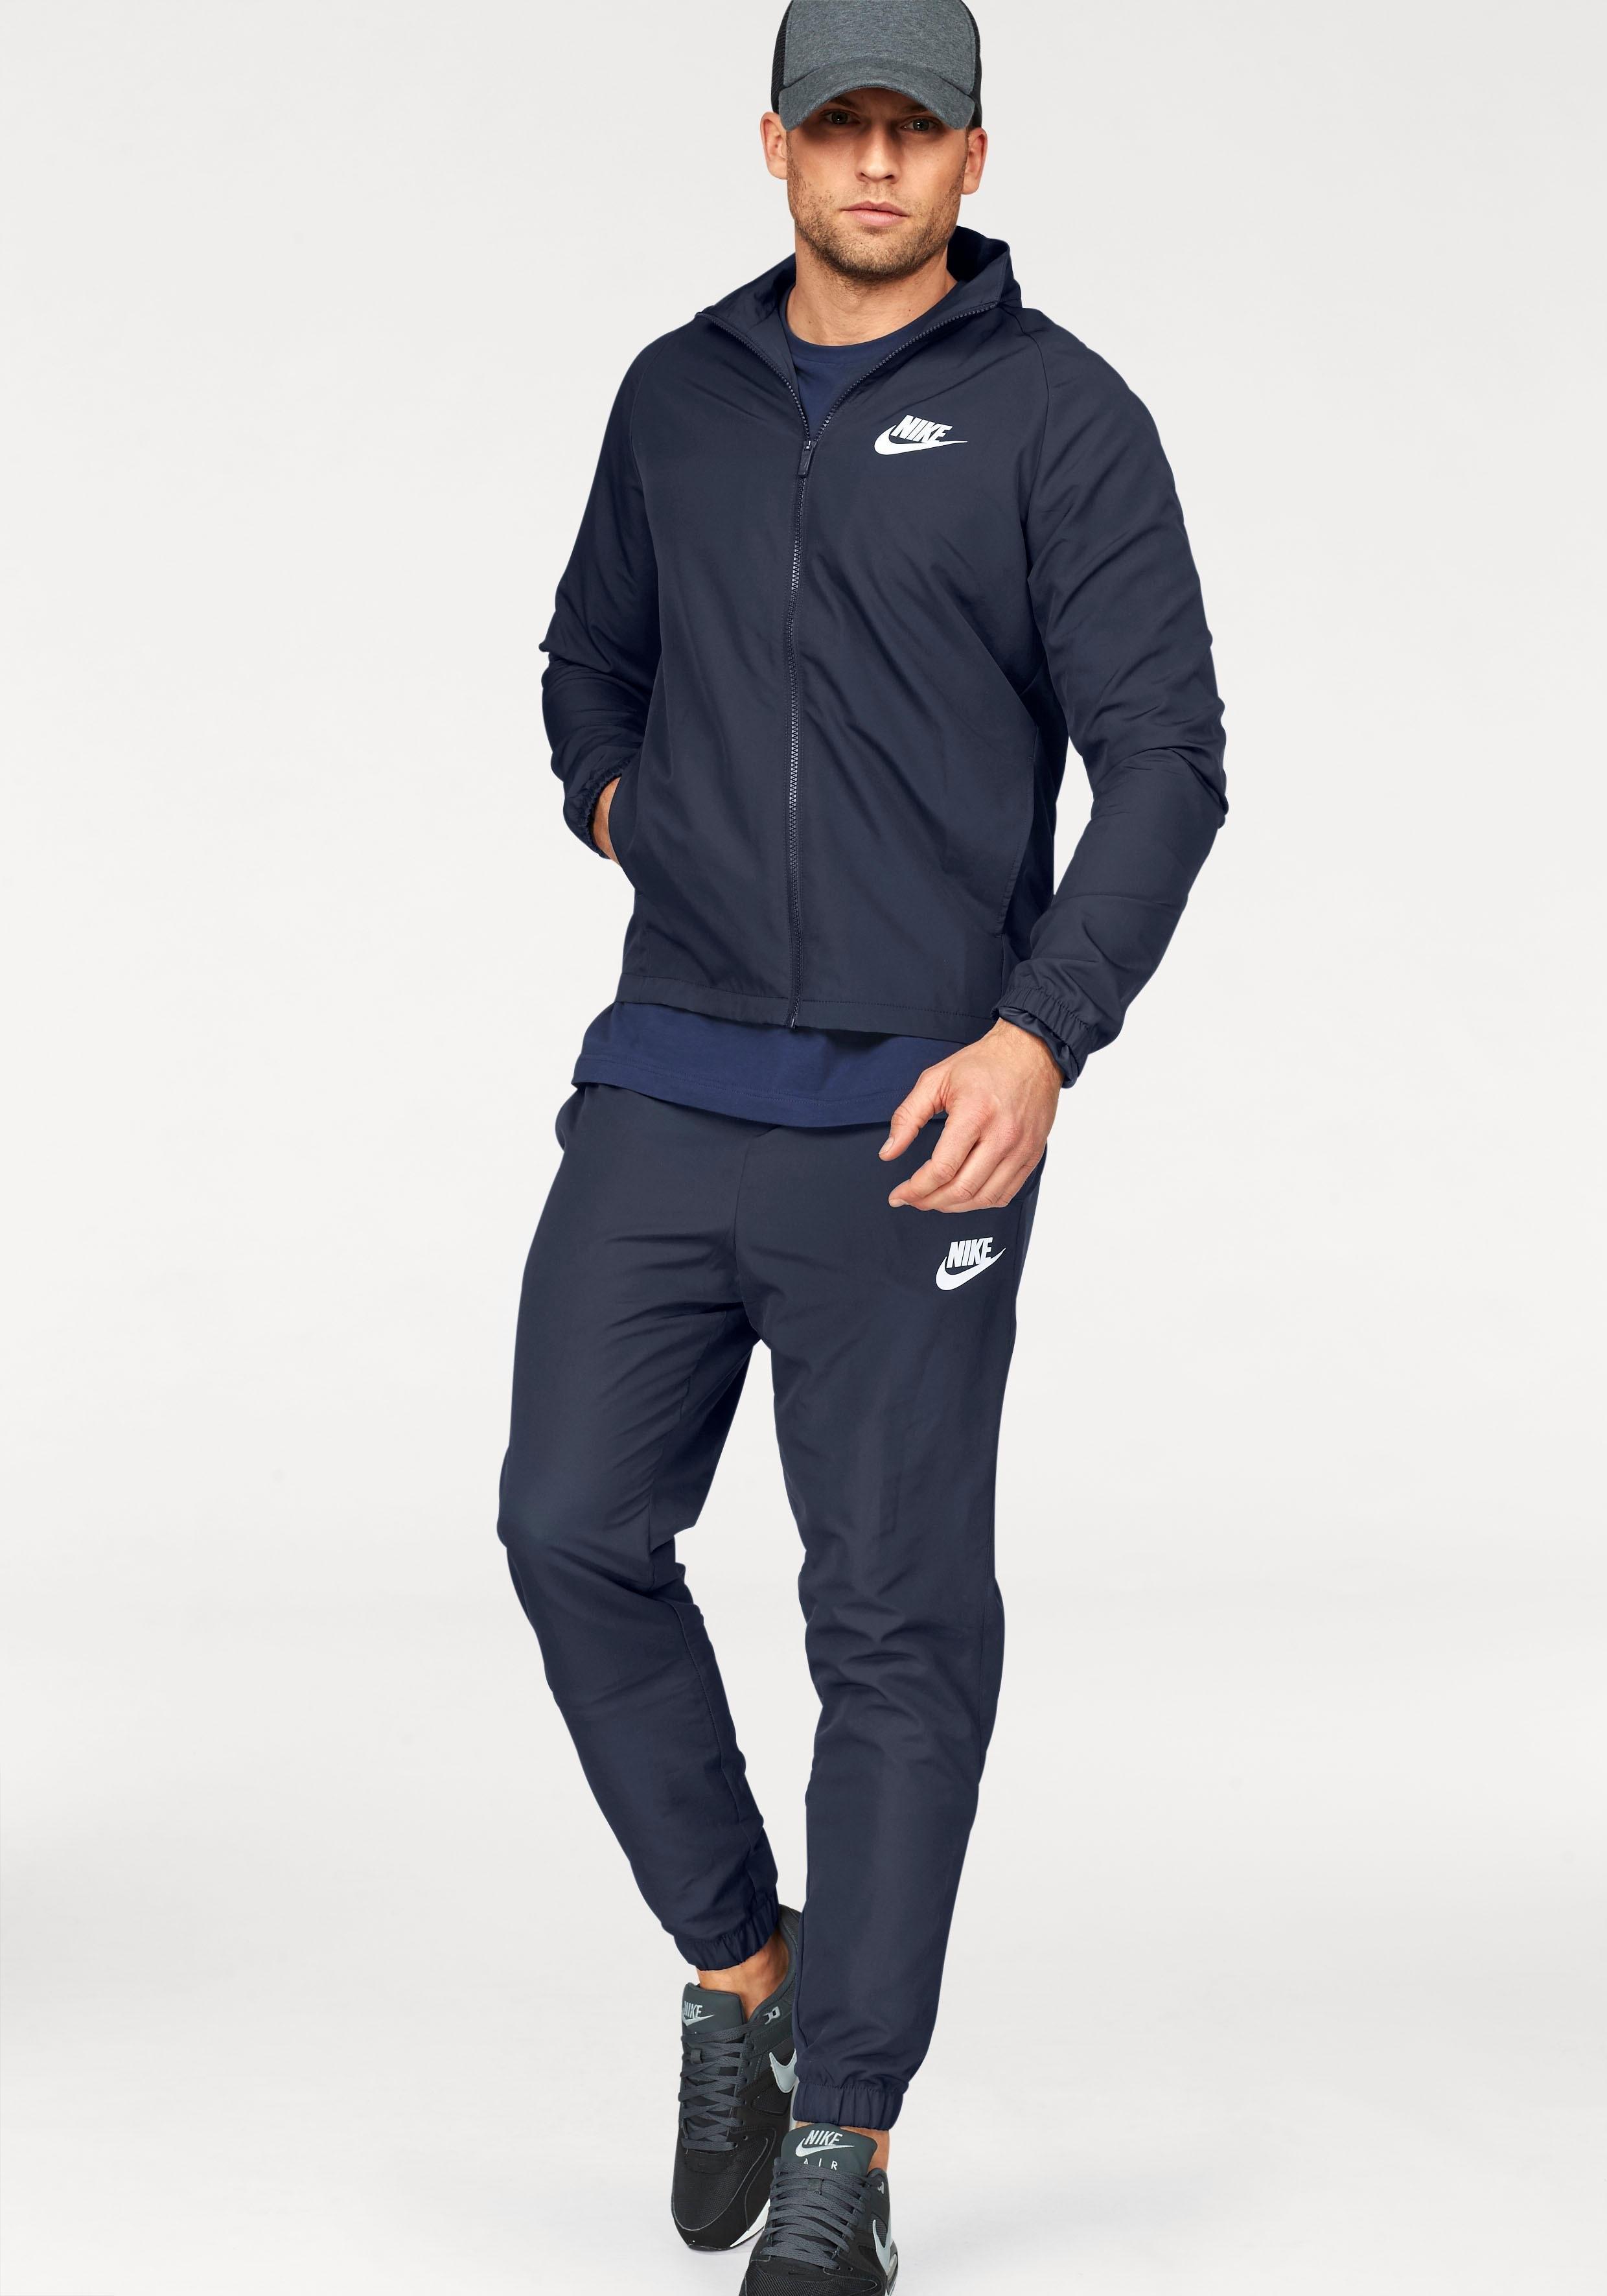 432abf01df3 ... Nike Sportswear trainingspak »M NSW TRK SUIT PK BASIC«, PUMA  trainingspak »ICONIC TRICOT SUIT CL«, adidas sportpak »MEN TRACK SUIT«,  PUMA trainingspak » ...